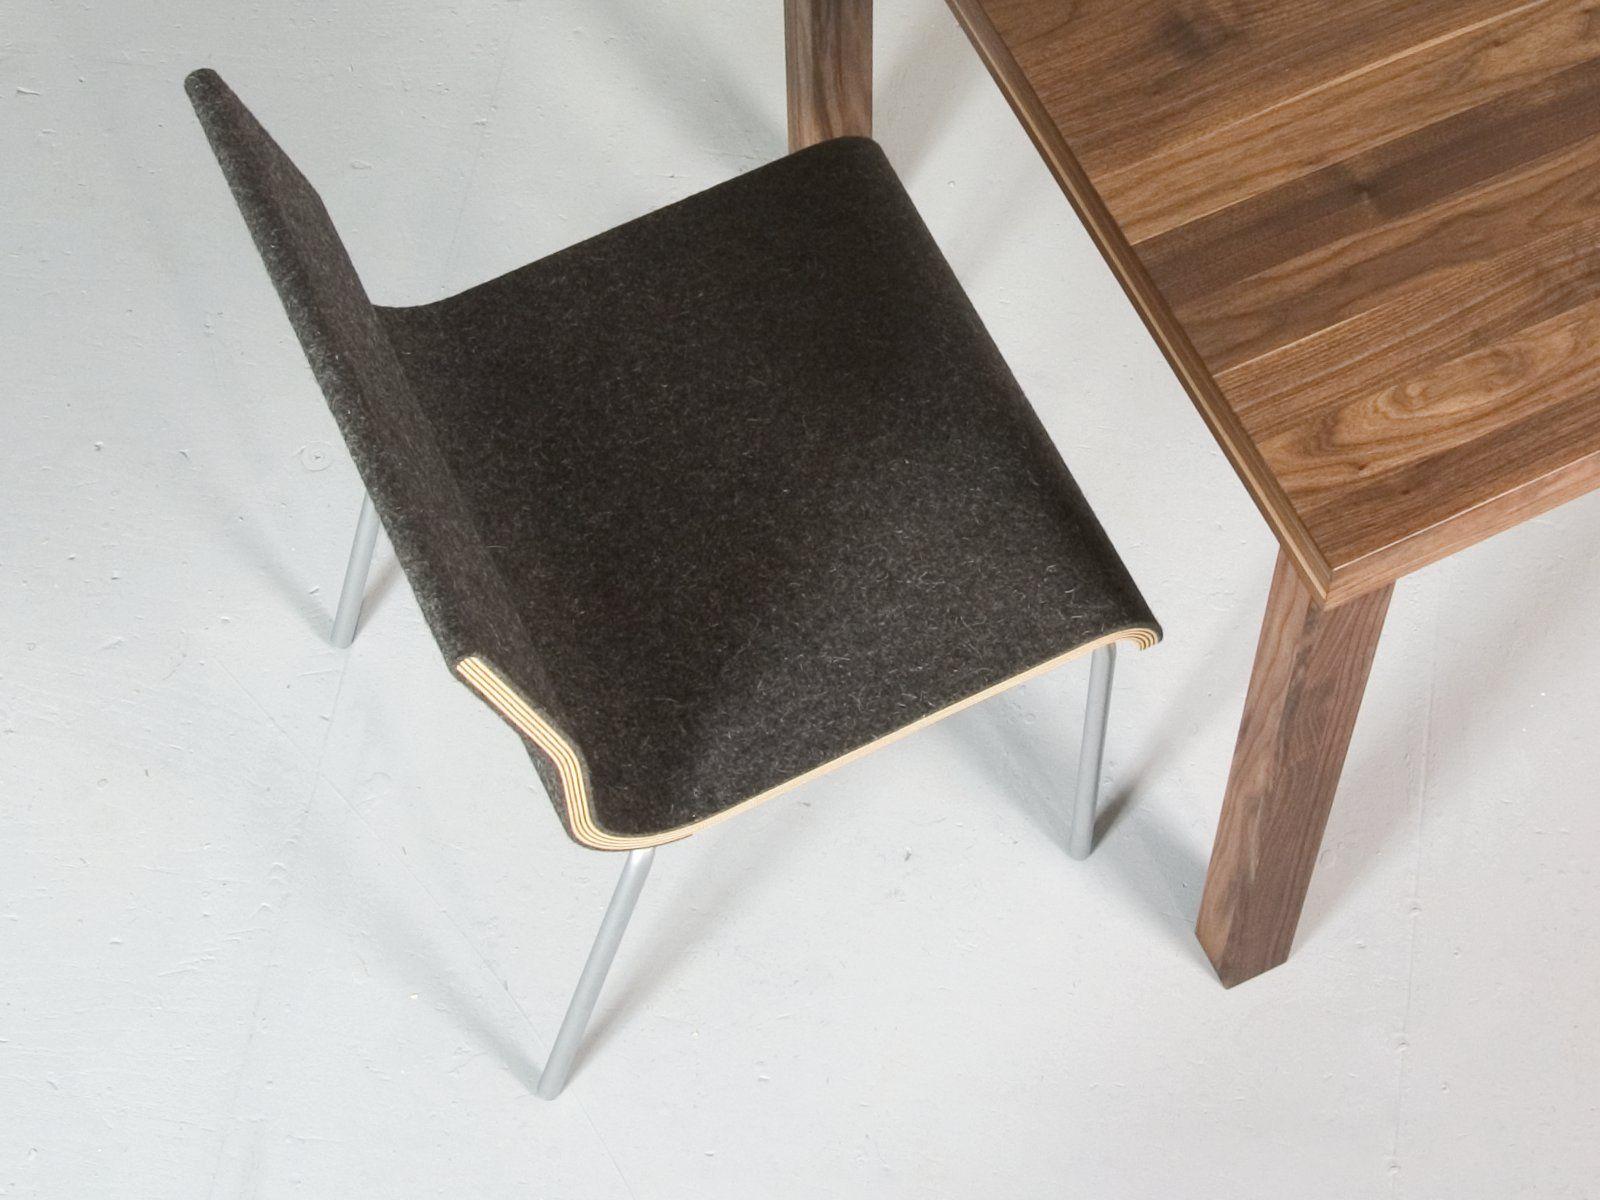 stuhl aus filz slow by sanktjohanser design matthias. Black Bedroom Furniture Sets. Home Design Ideas